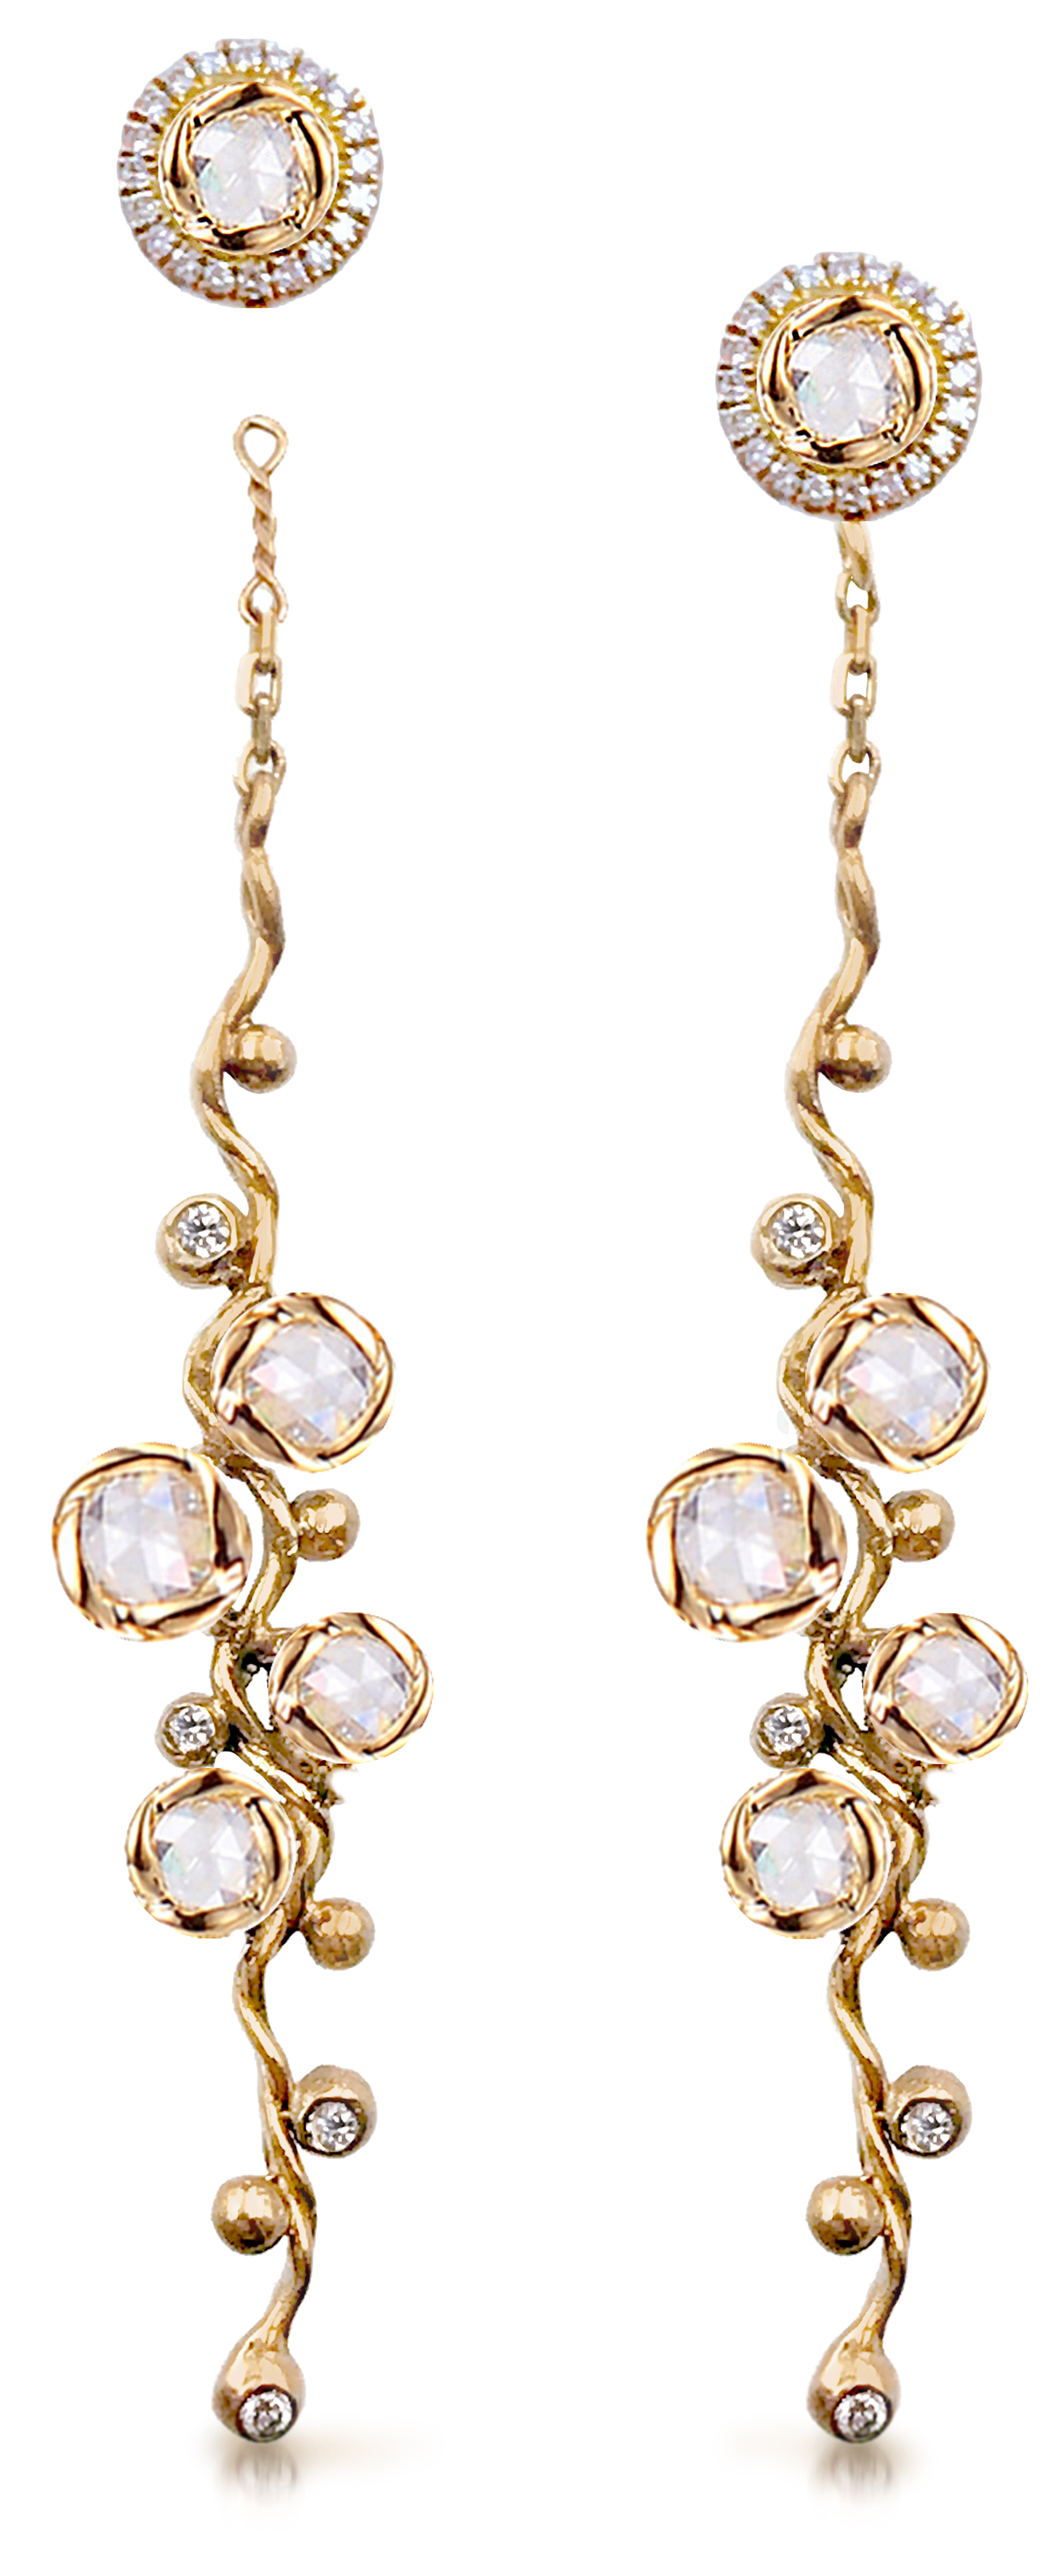 Best Diamond Jewelry (Under $10,000) – 2019 winner